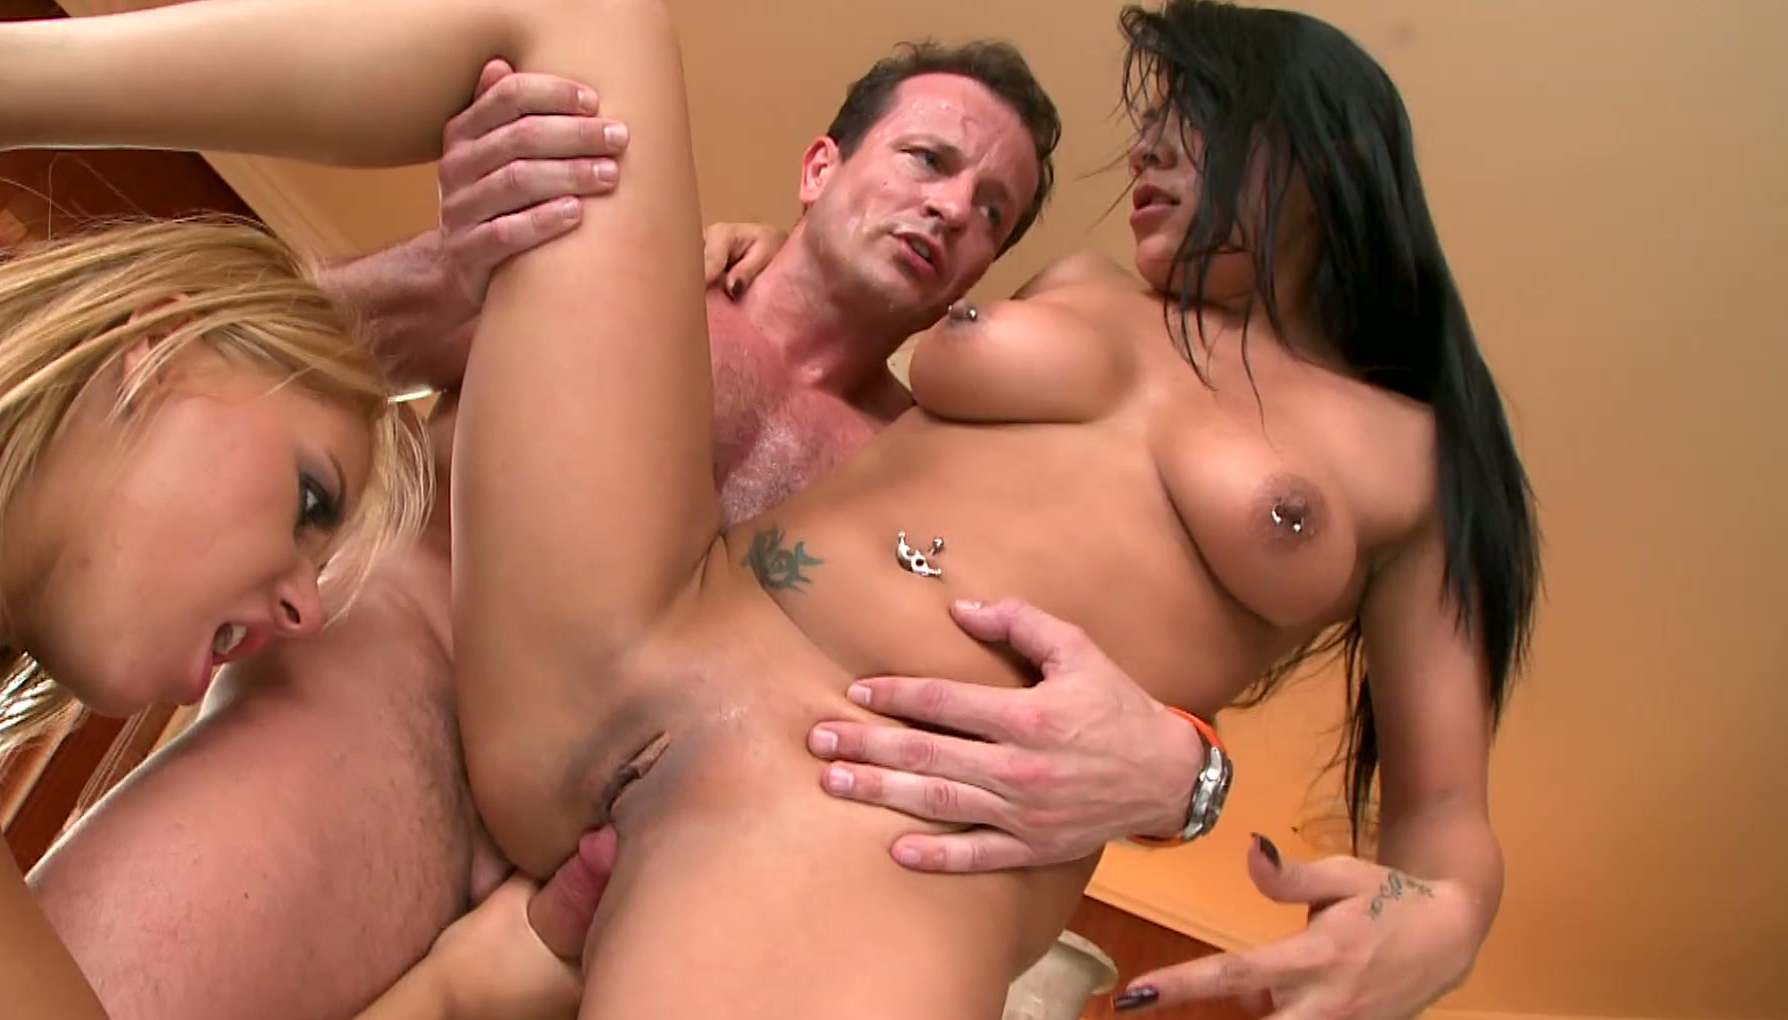 mouth latina cock huge